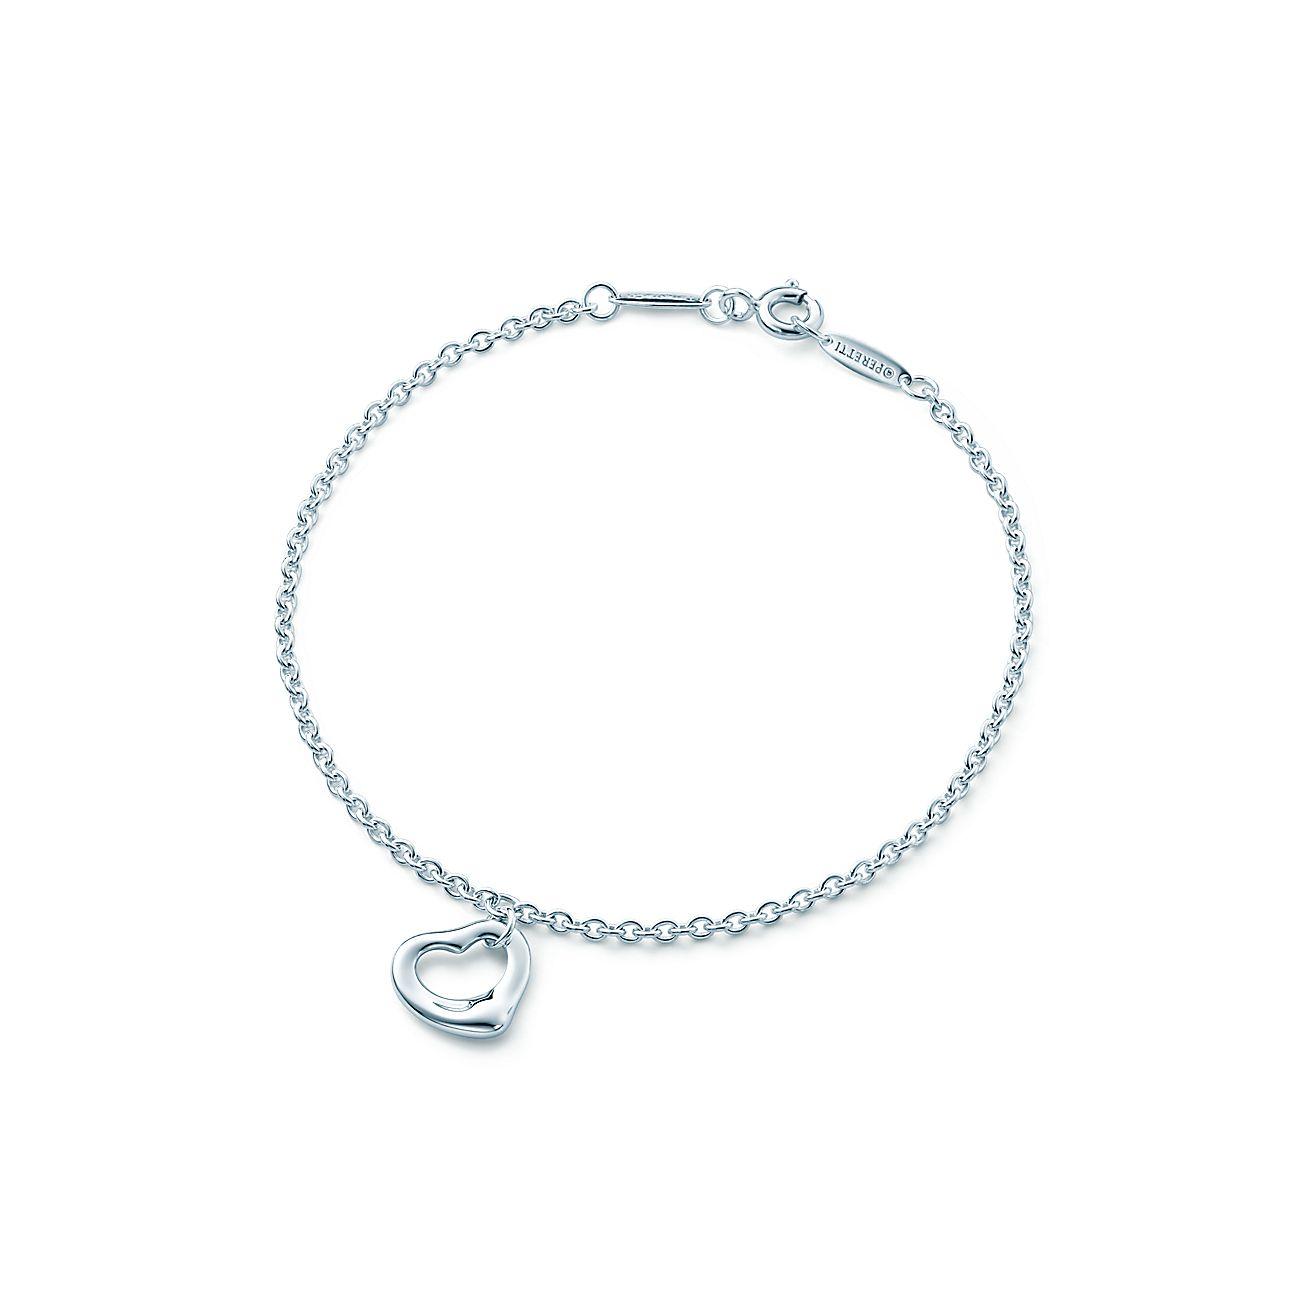 Tiffany Heart Bracelet >> Elsa Peretti Sterling Silver Open Heart Bracelet Tiffany Co